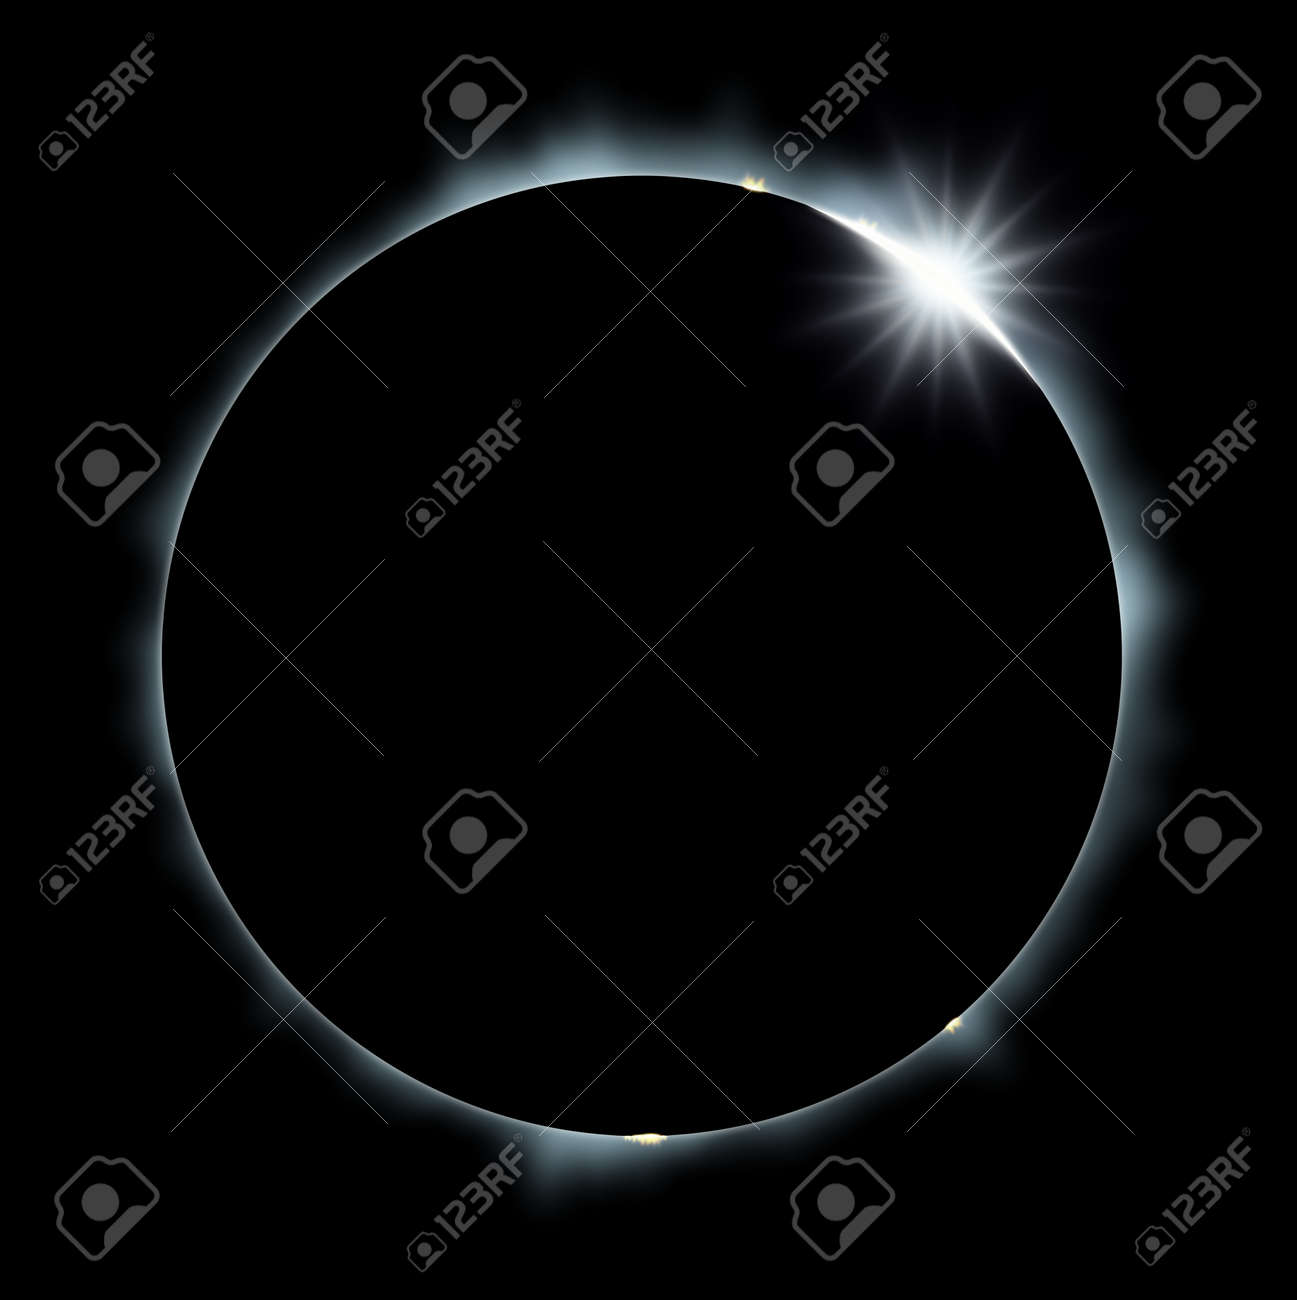 Full Eclipse of the Sun Stock Photo - 12887800